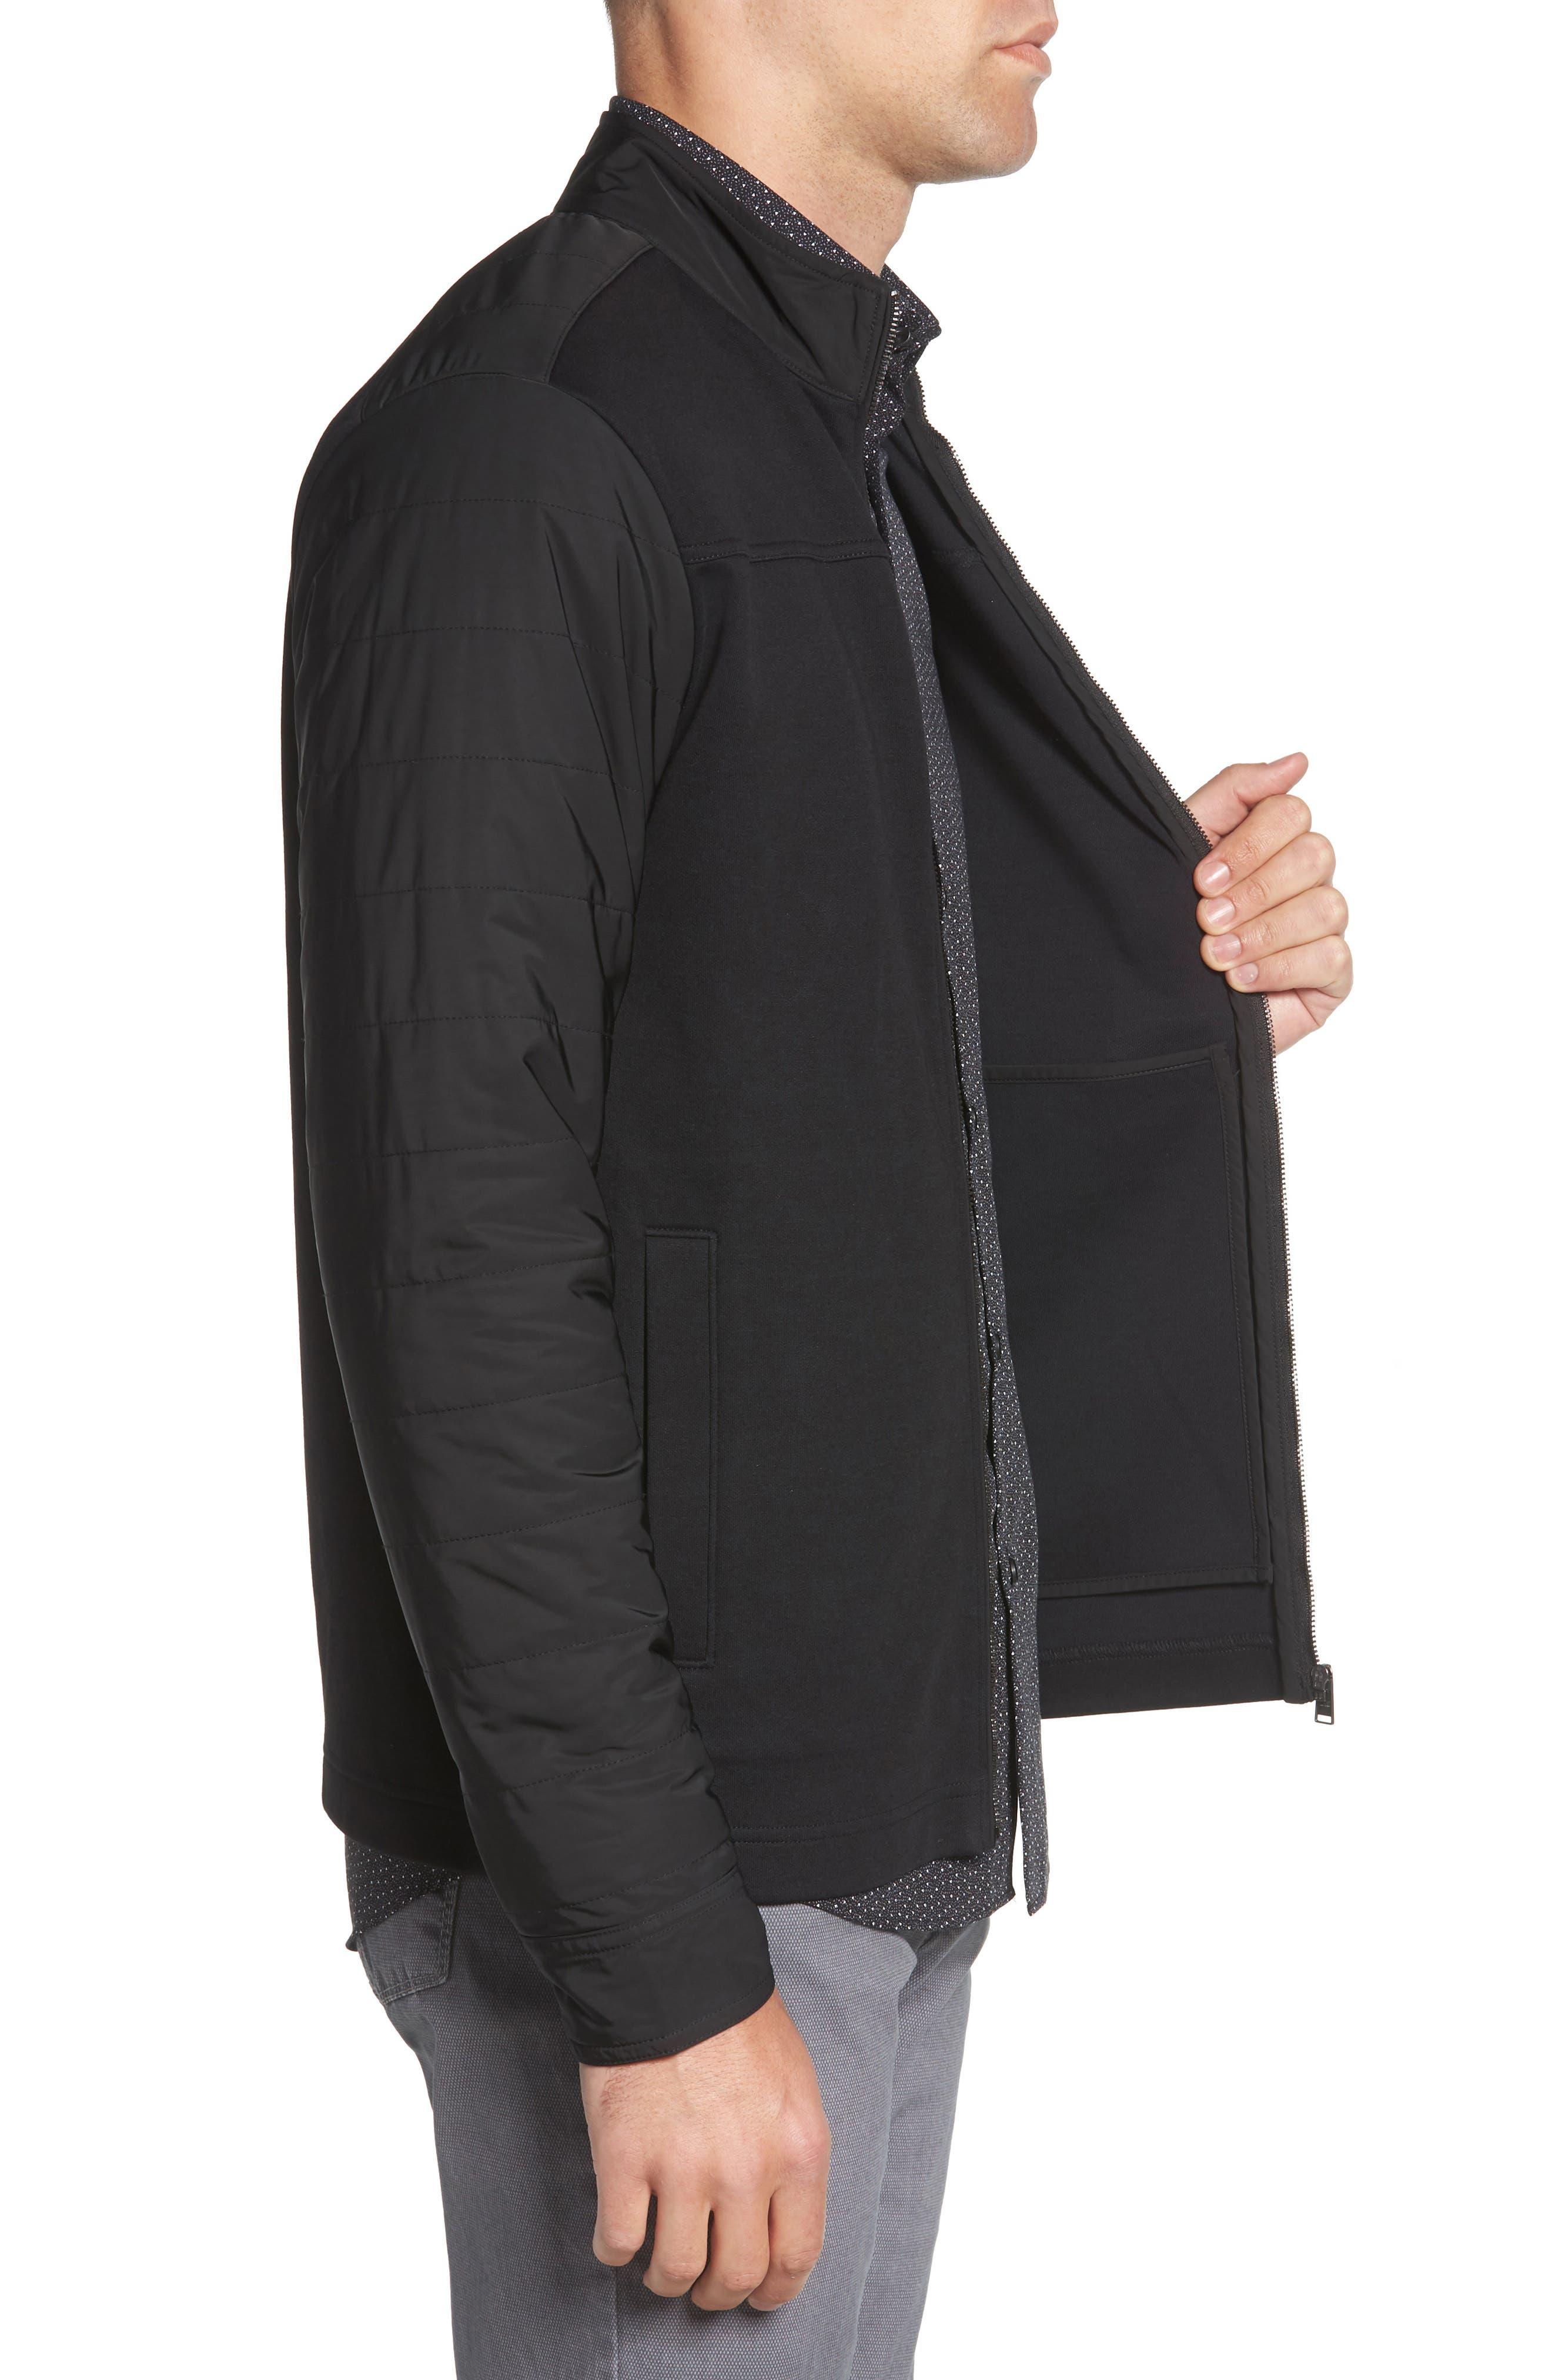 Soule Slim Fit Moto Jacket,                             Alternate thumbnail 3, color,                             BLACK